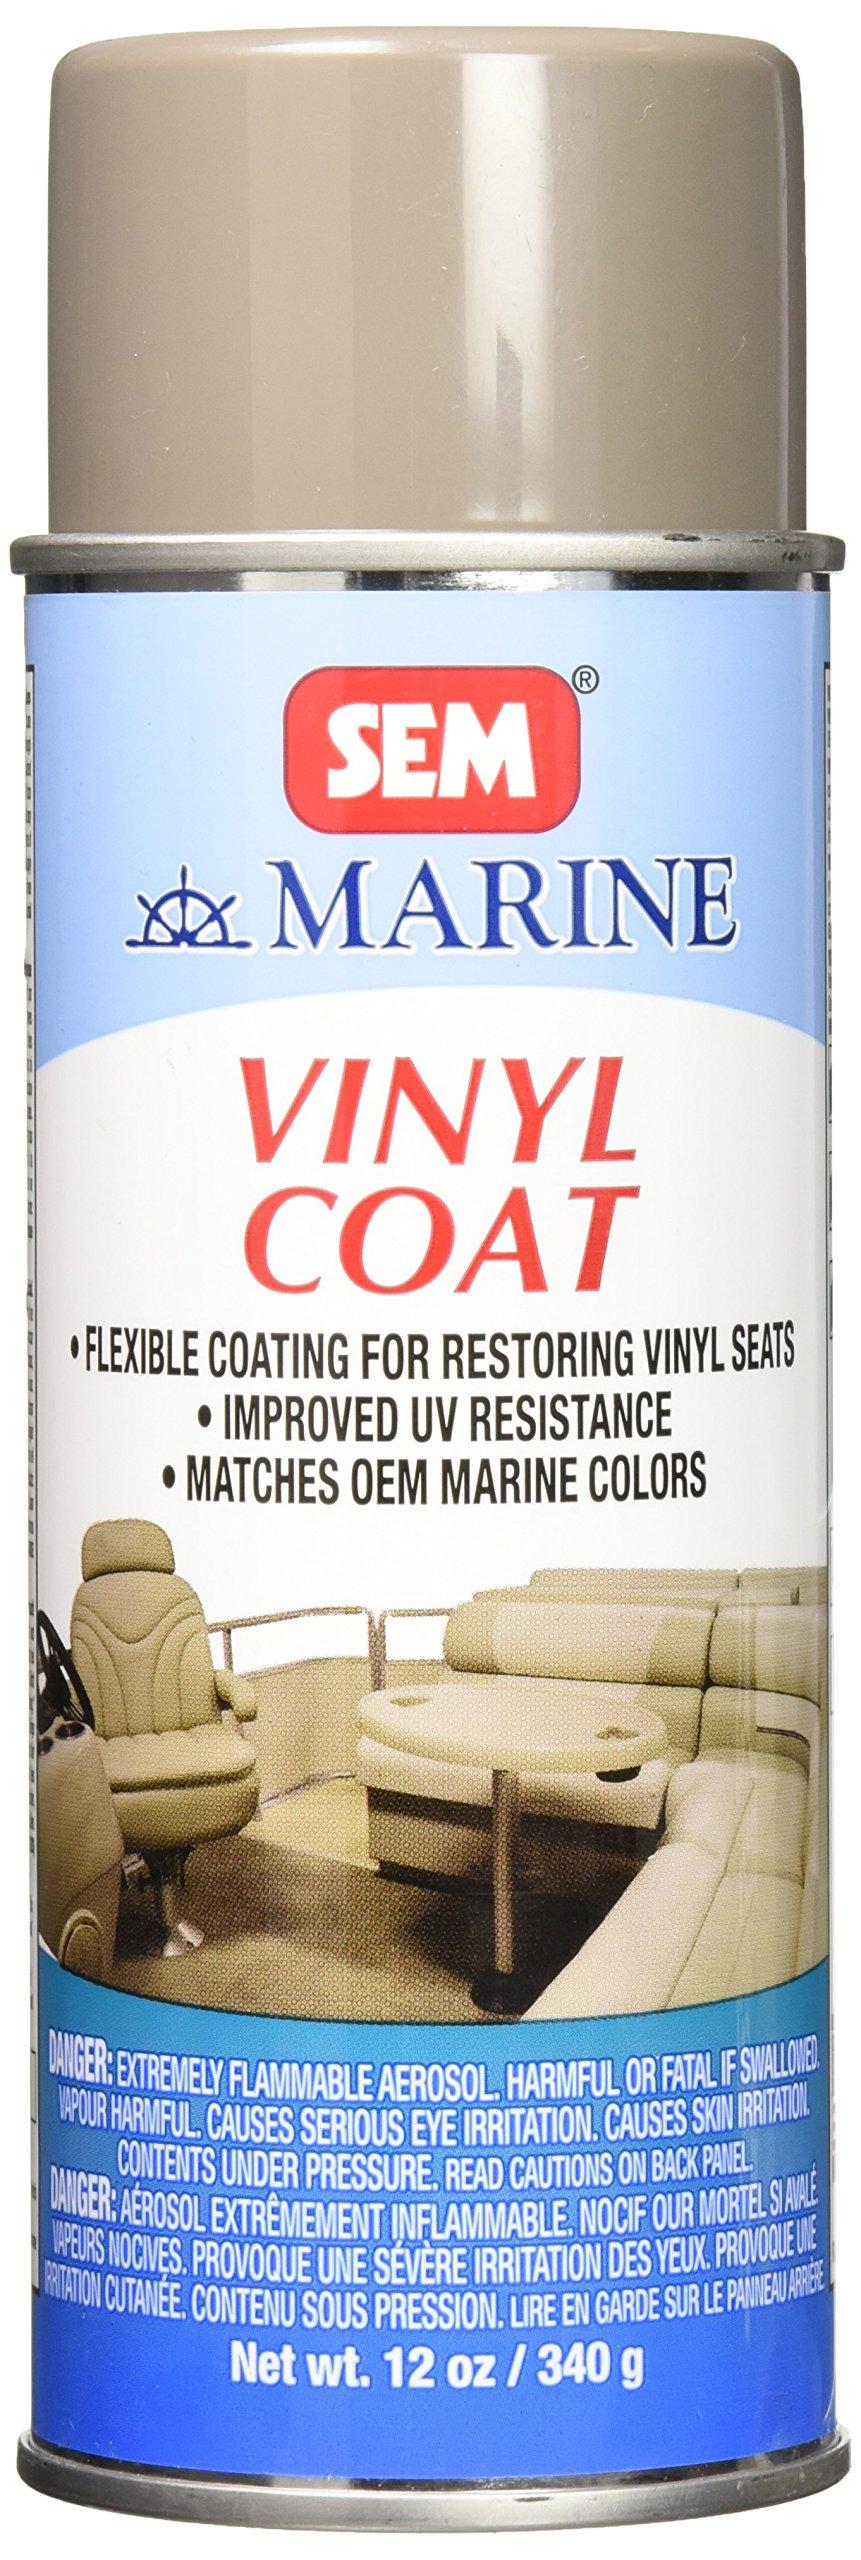 SEM M25163 Ranger Beige Marine Vinyl Coat - 16 oz.